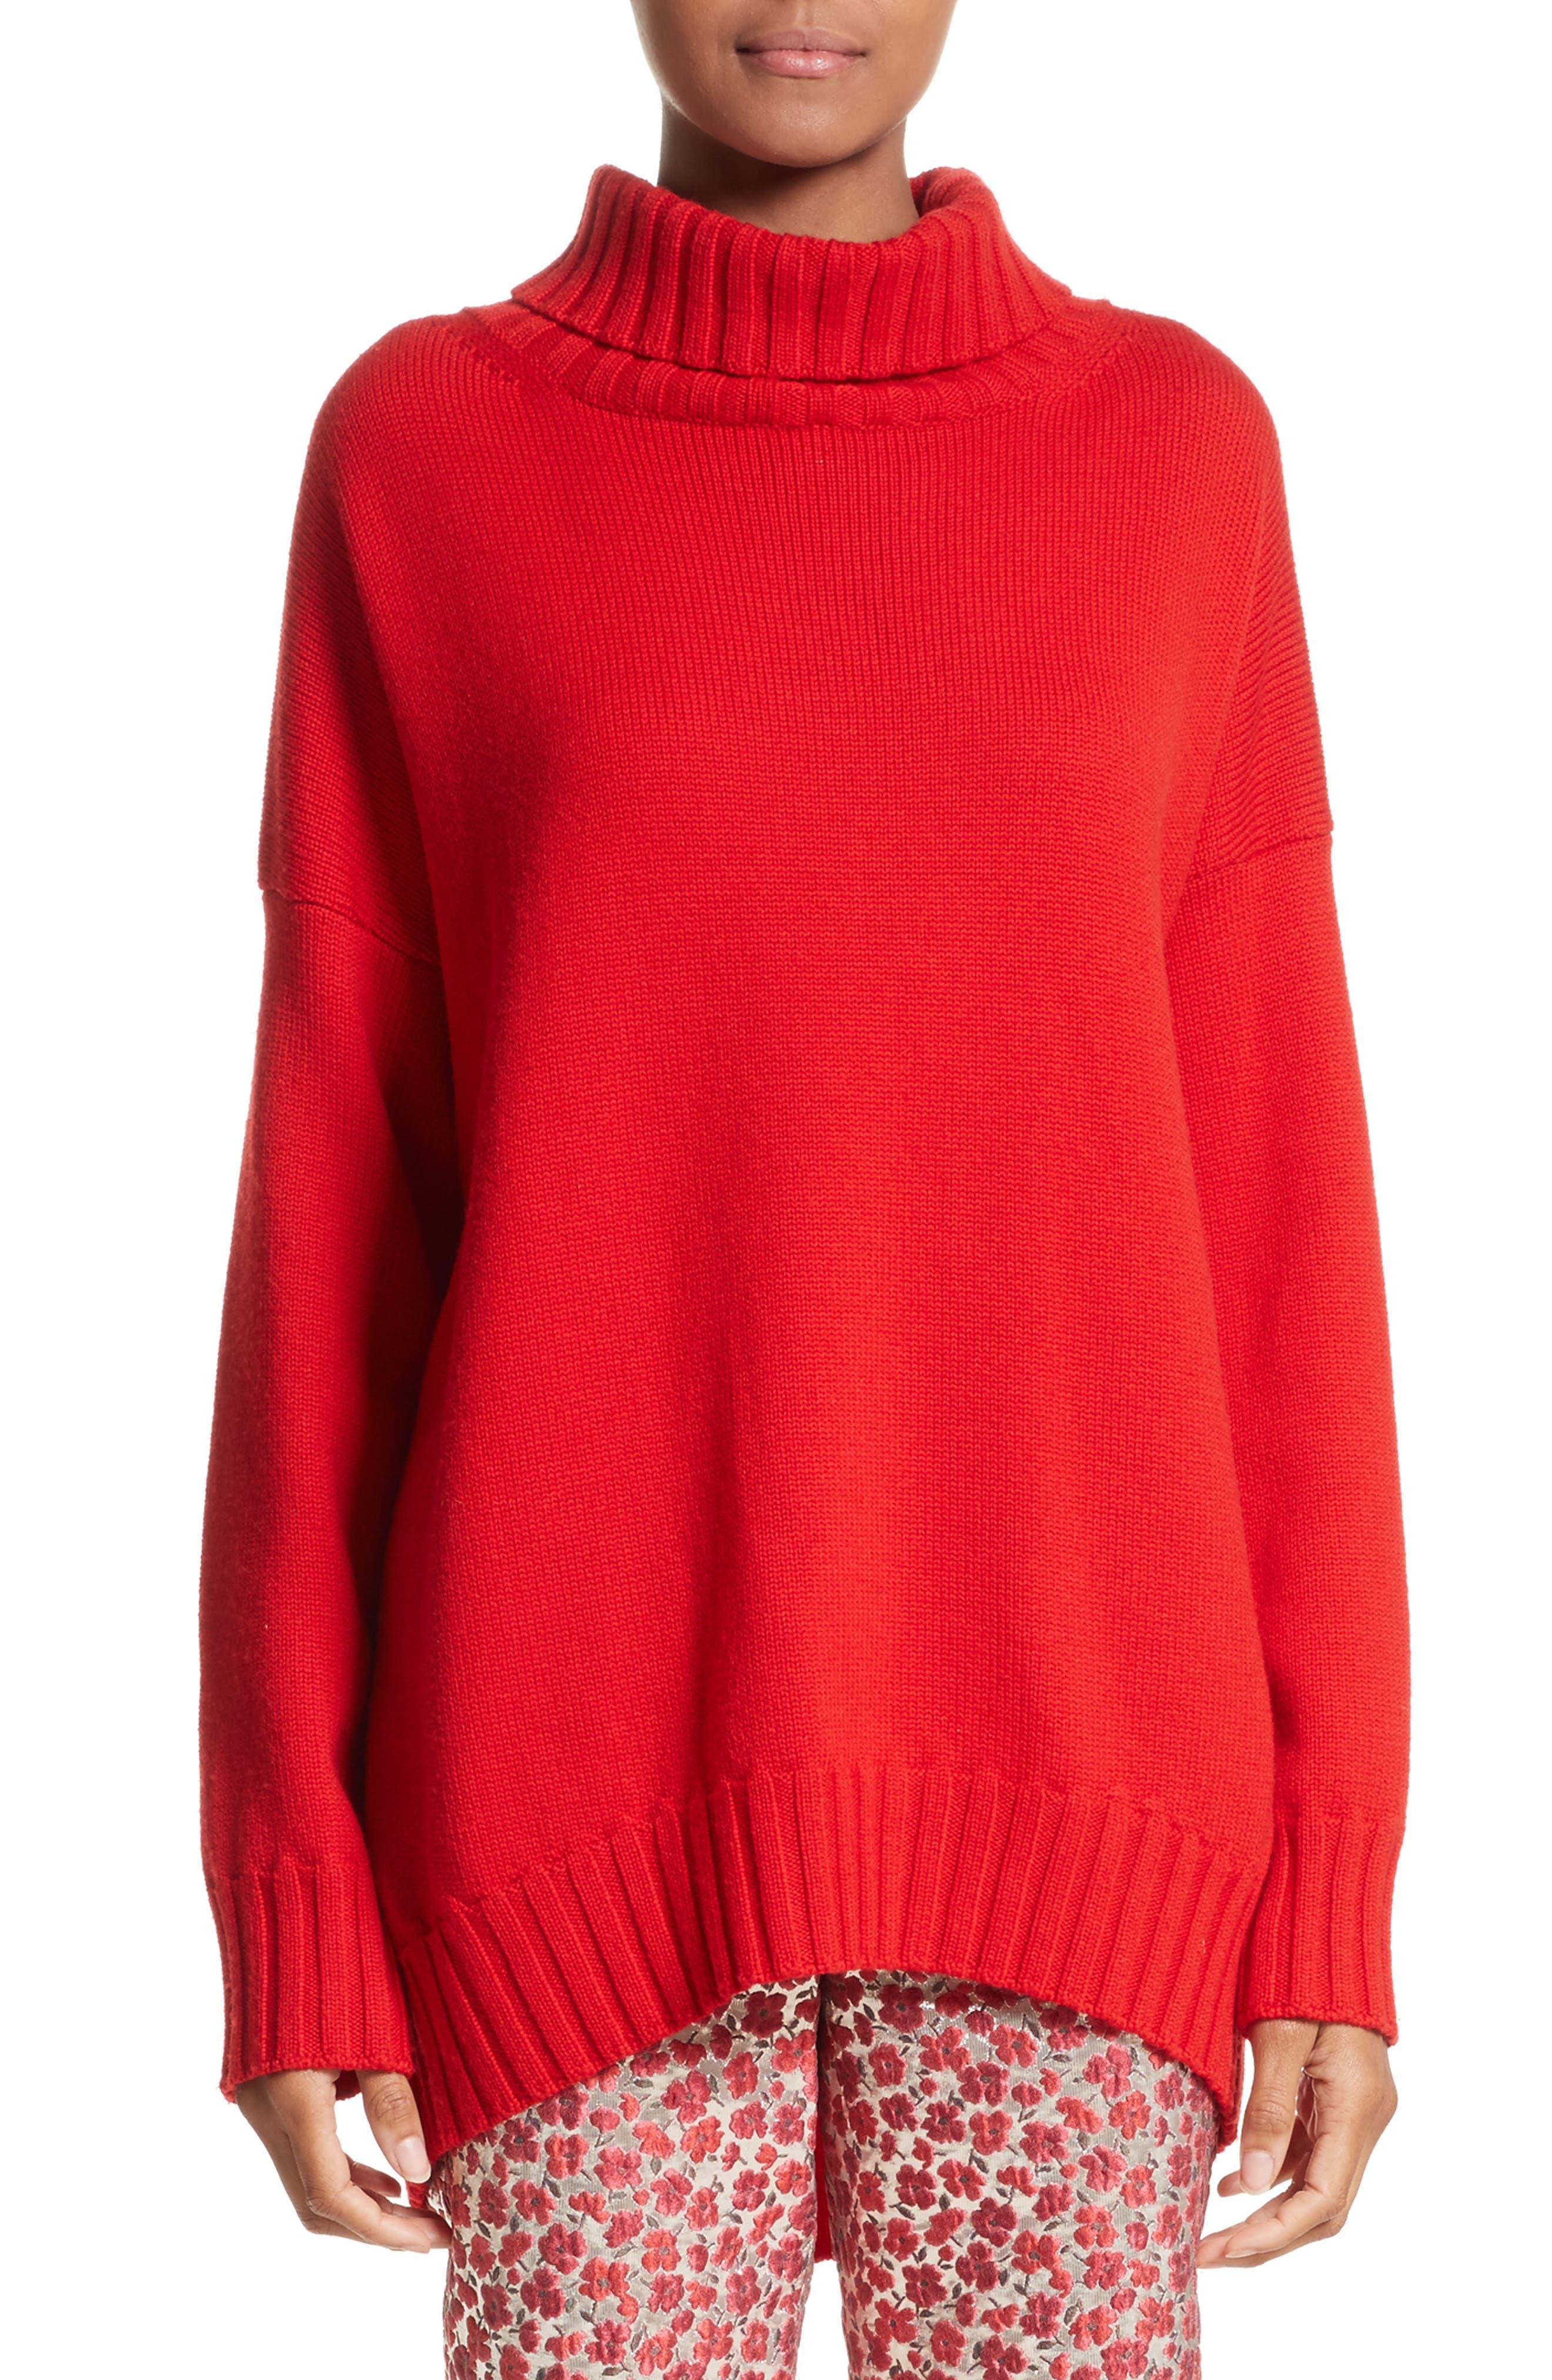 Main Image - Oscar de la Renta Virgin Wool Turtleneck Sweater